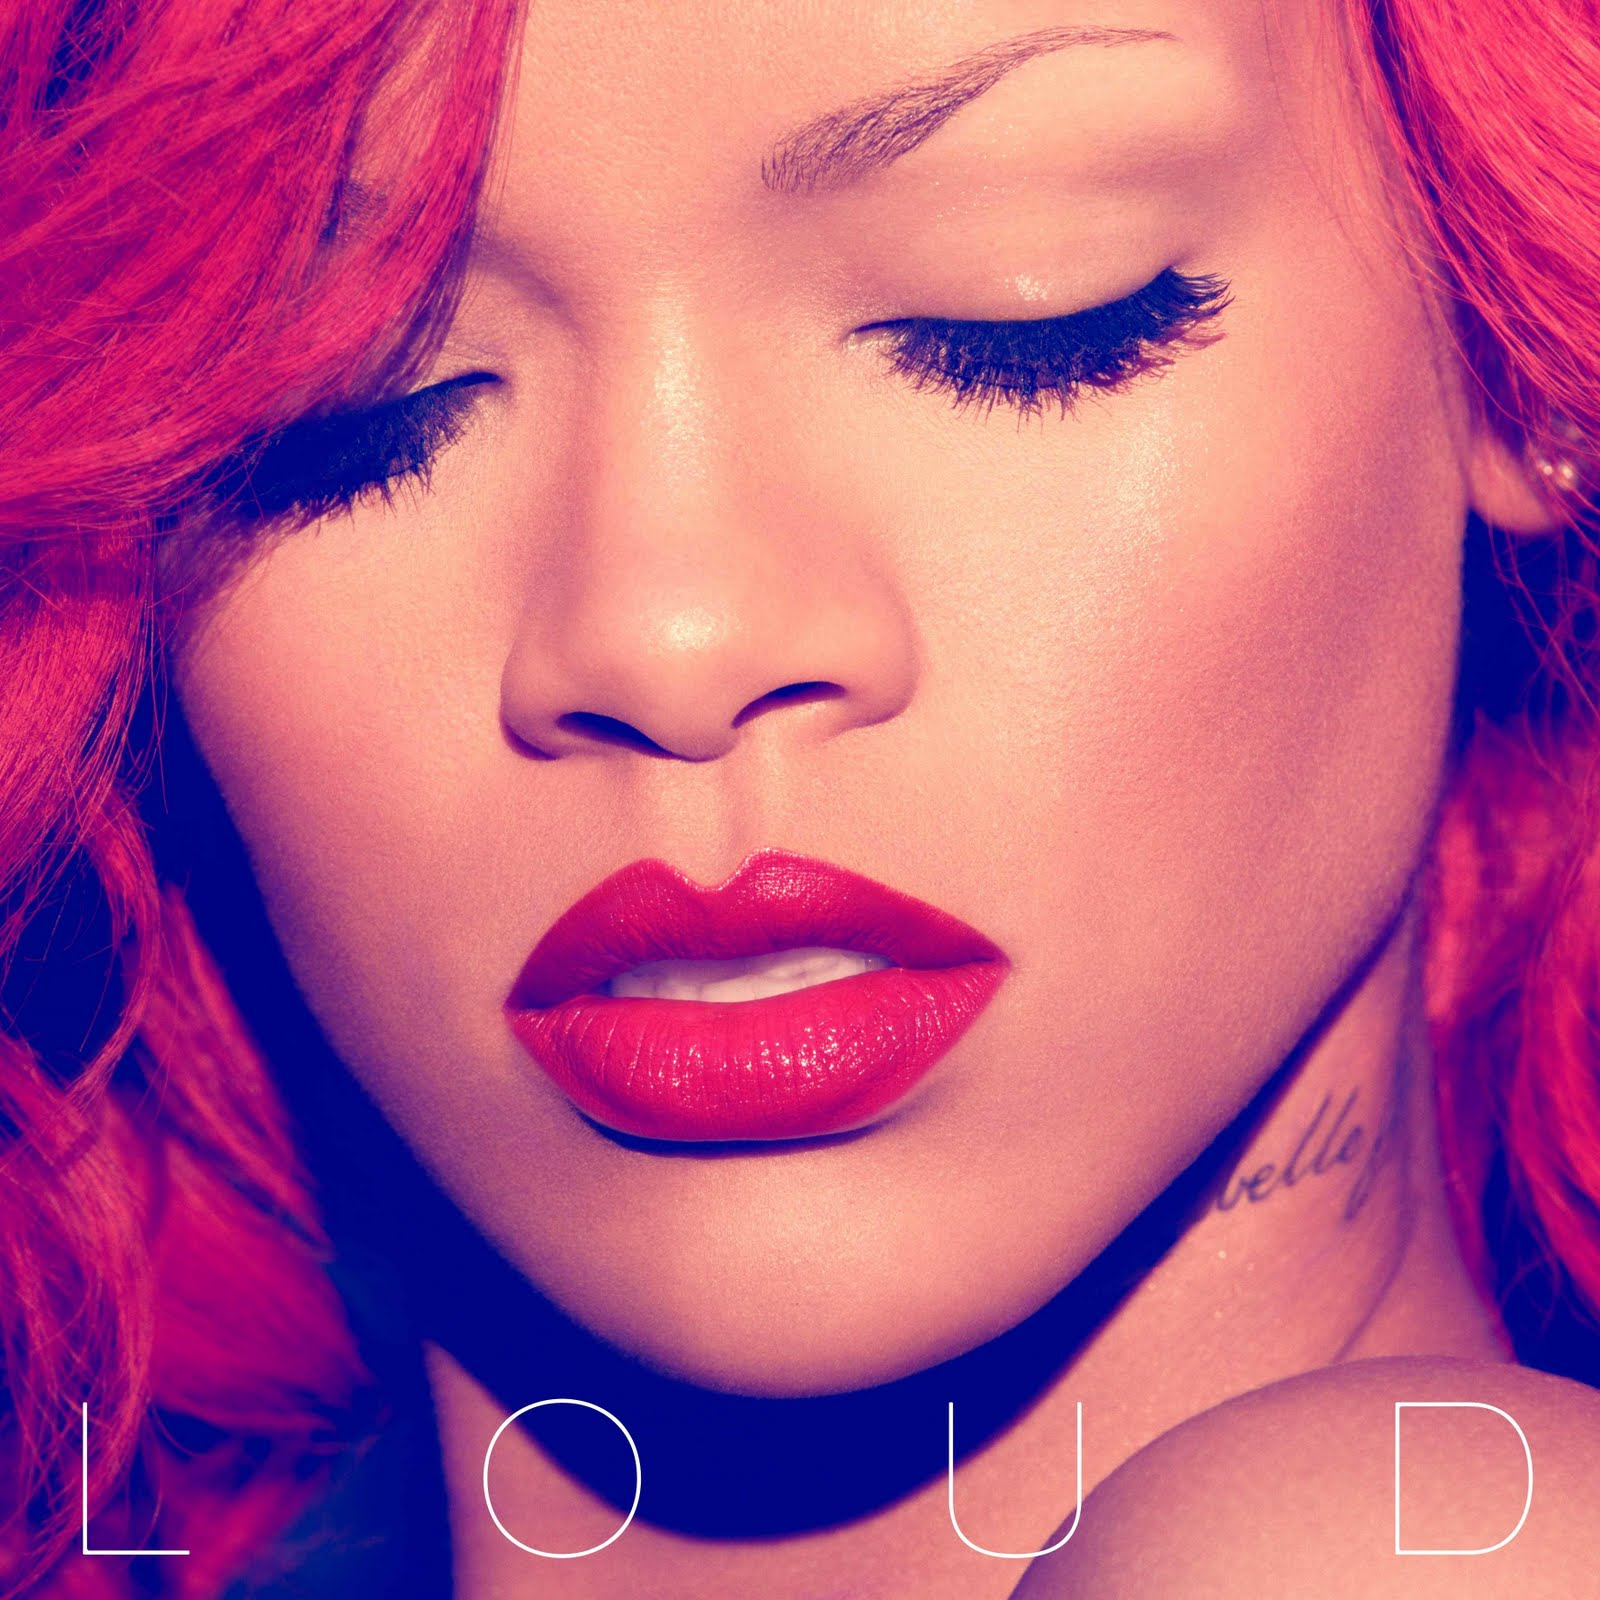 http://1.bp.blogspot.com/_bq9TcMaVMGw/TS8MfZAYOEI/AAAAAAAAFMQ/mqE5KHEd5oY/s1600/Rihanna+-+Loud.jpg